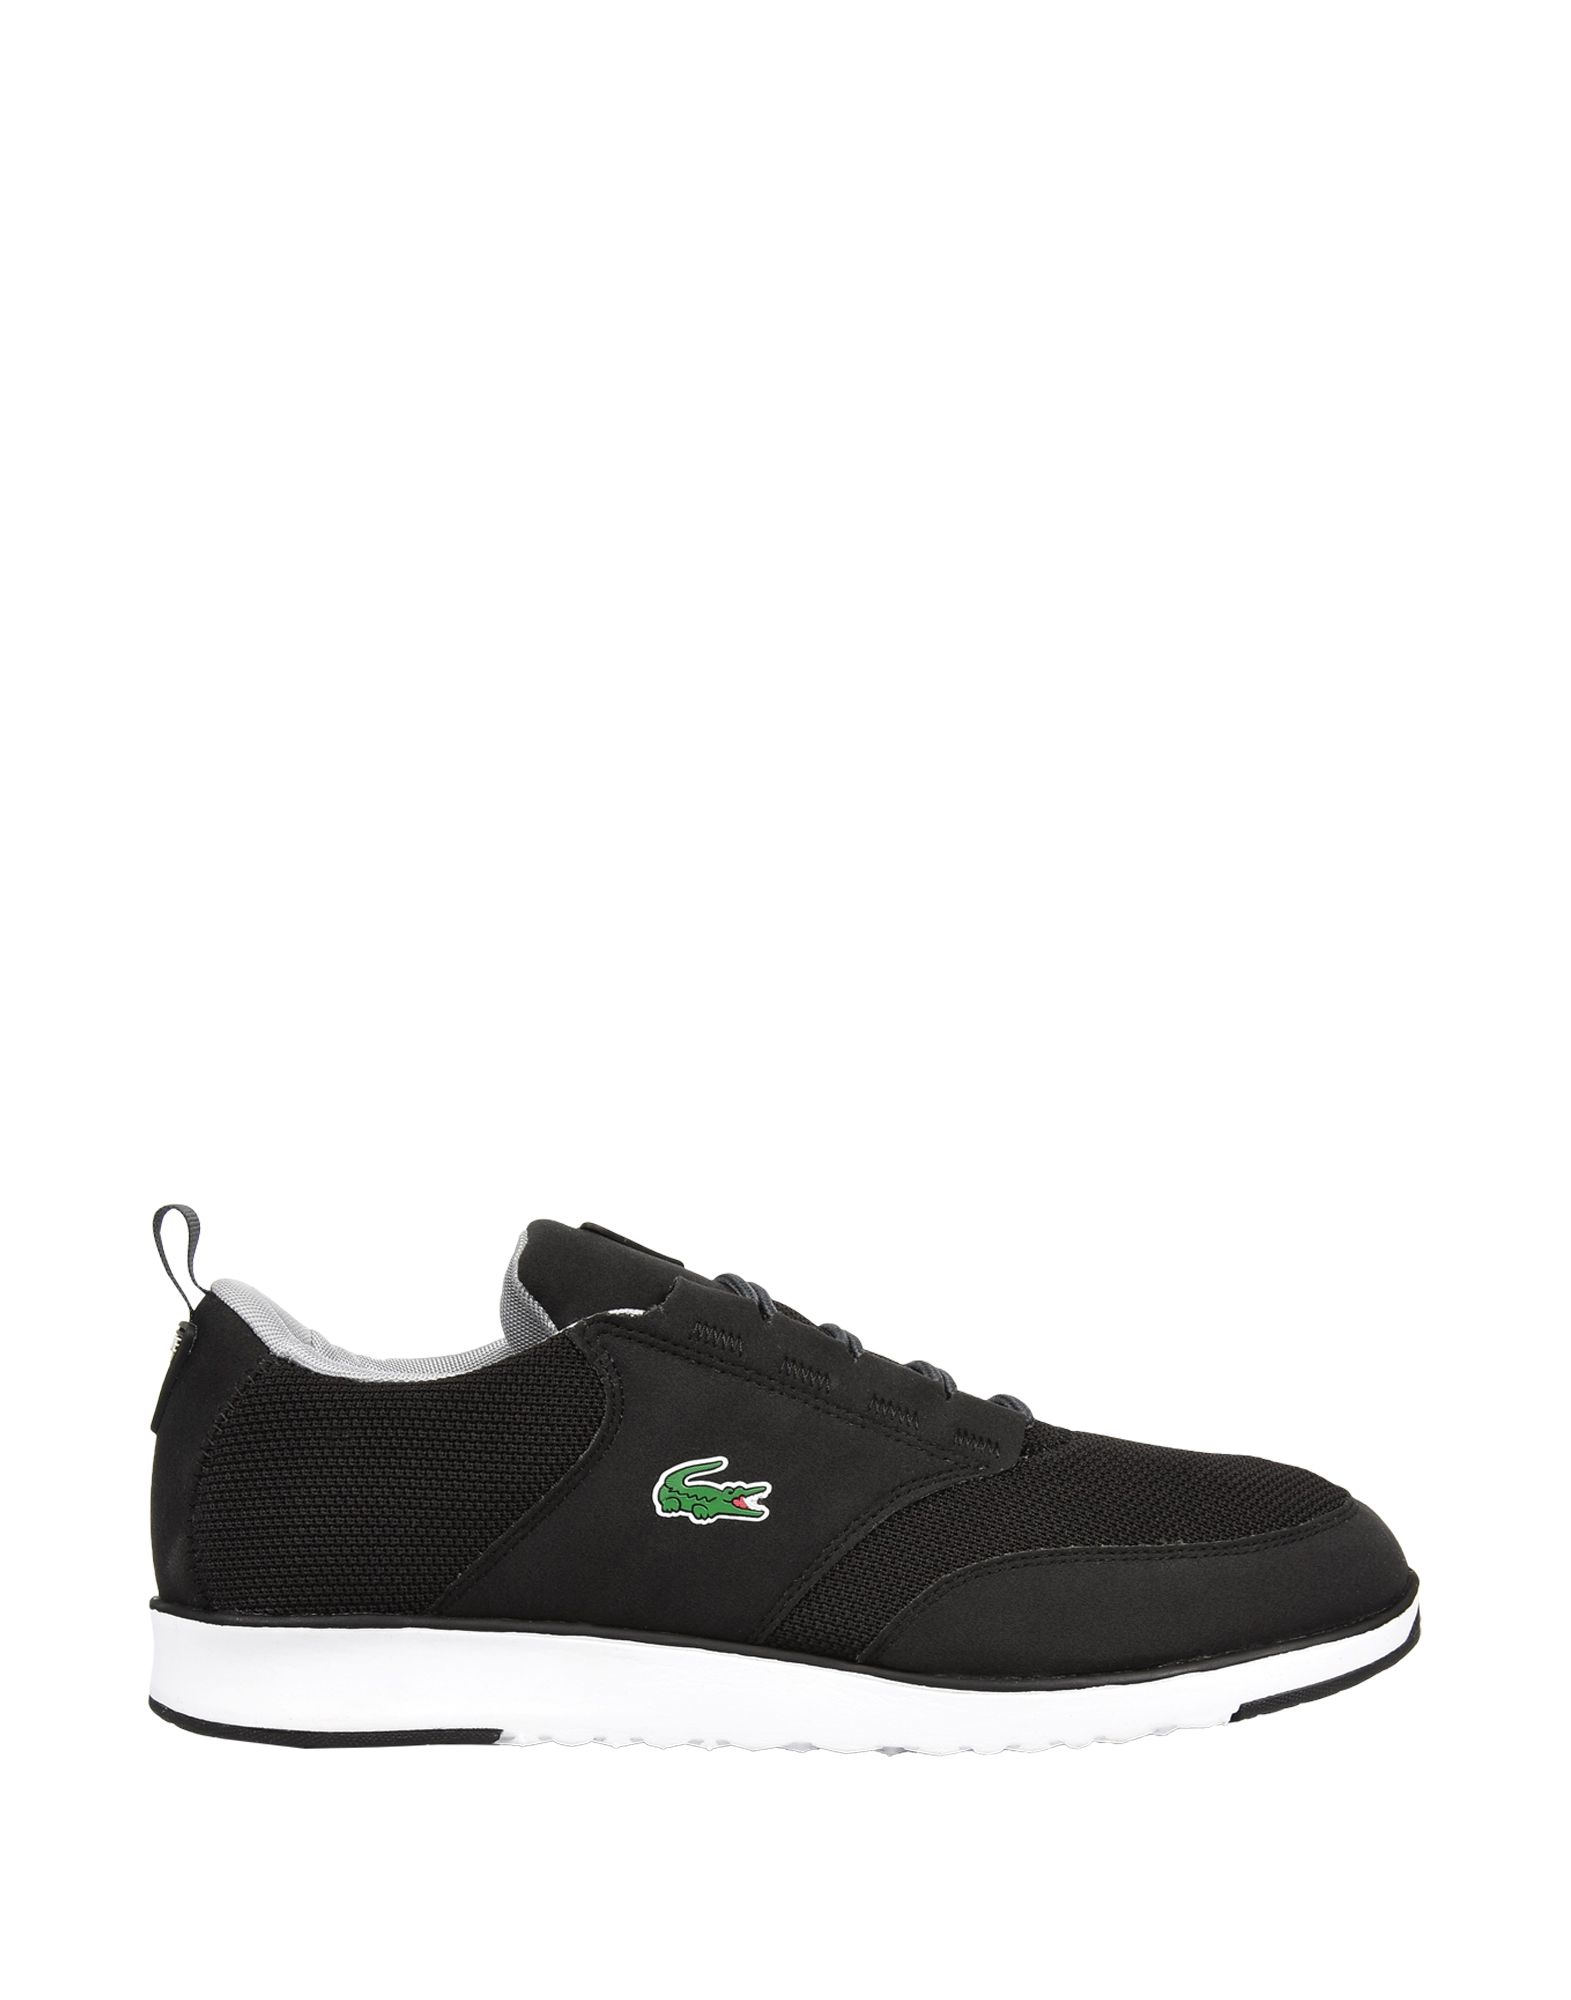 Sneakers Lacoste Sport L.Ight 117 1 - Homme - Sneakers Lacoste Sport sur